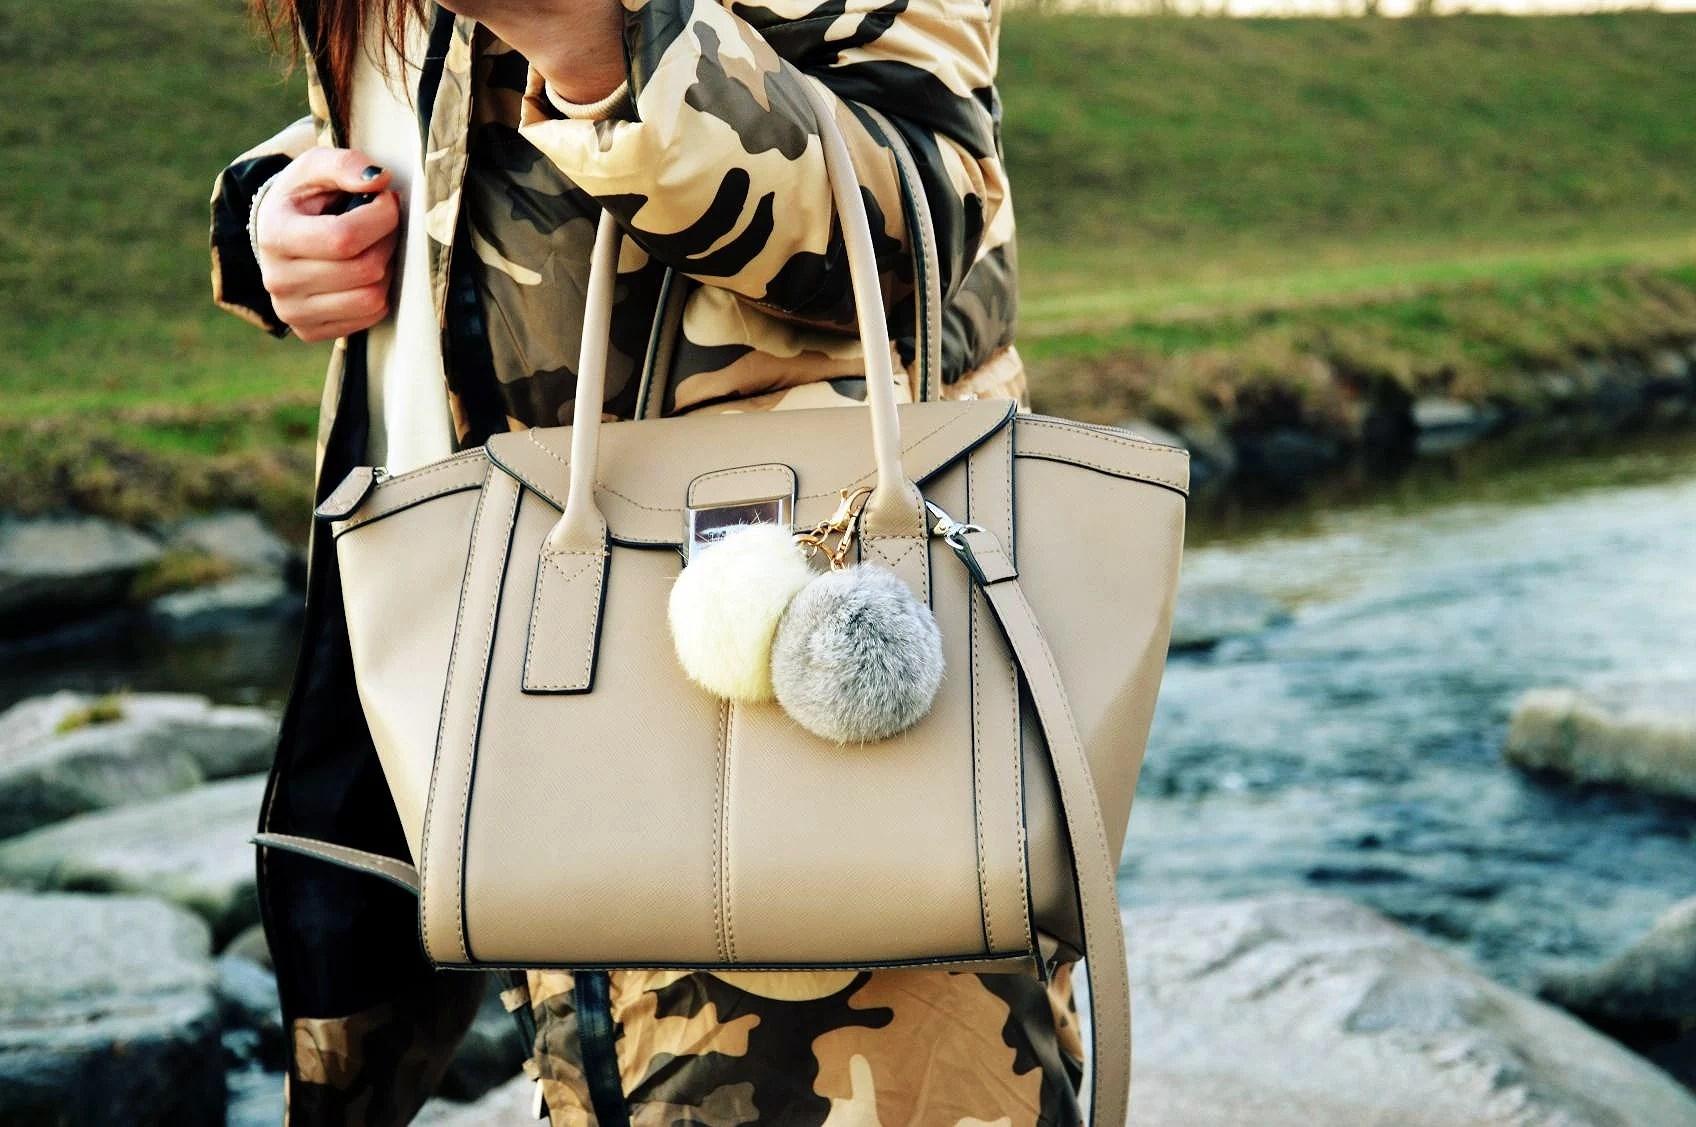 sh, secondhand, fashion, moda, stylizacja, magiclovv, bag, blogerka, torba, torebka,